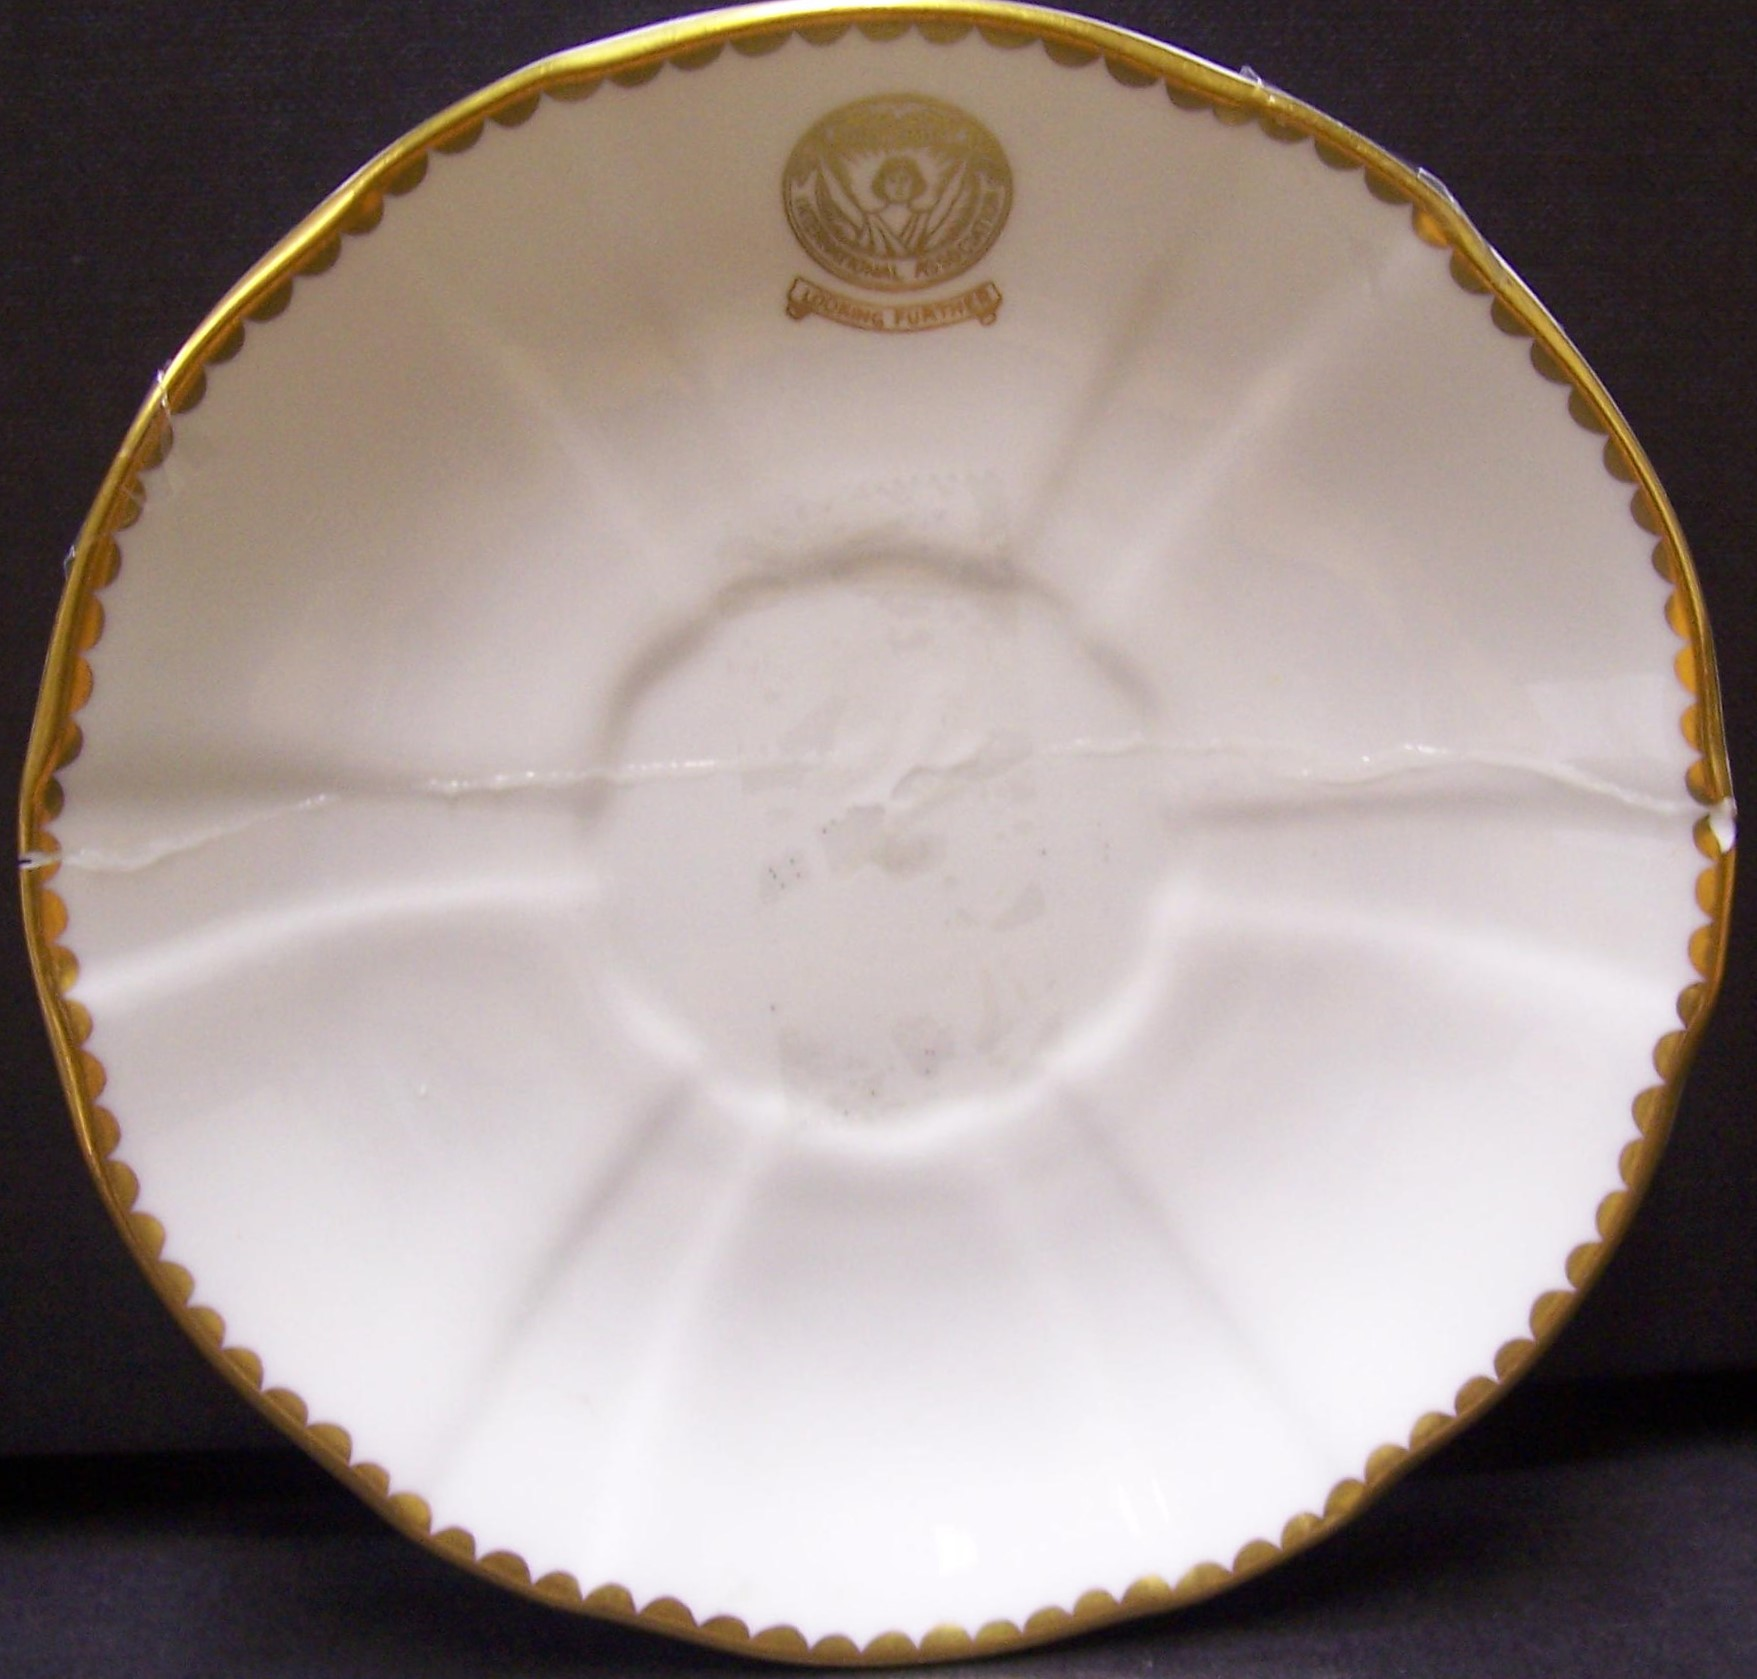 royal-crown-derby-surrey-saucer-soroptimist-international-association